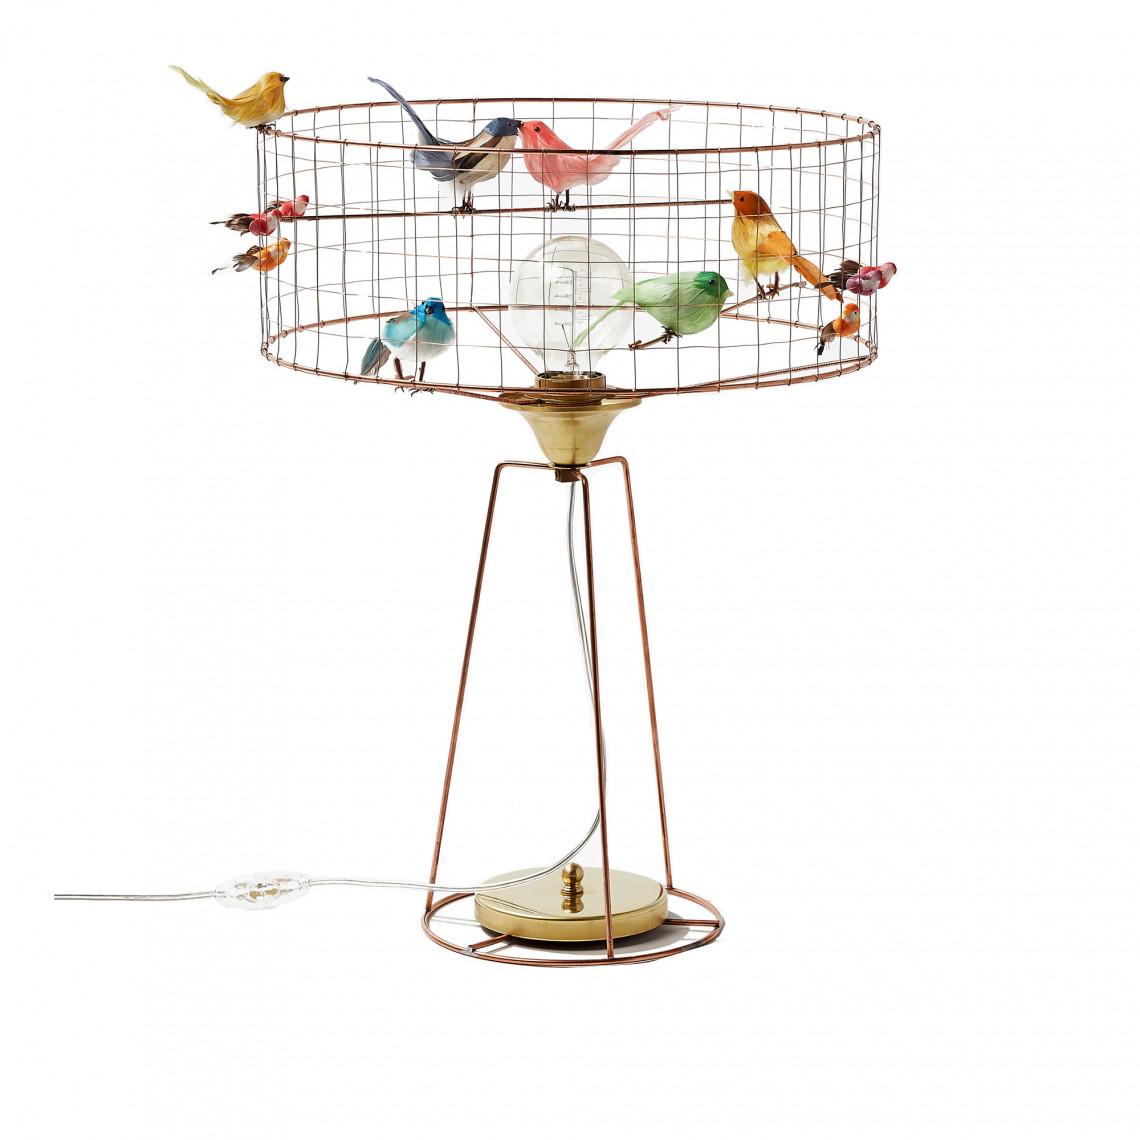 Fågellampa Lampe Volière Tambour